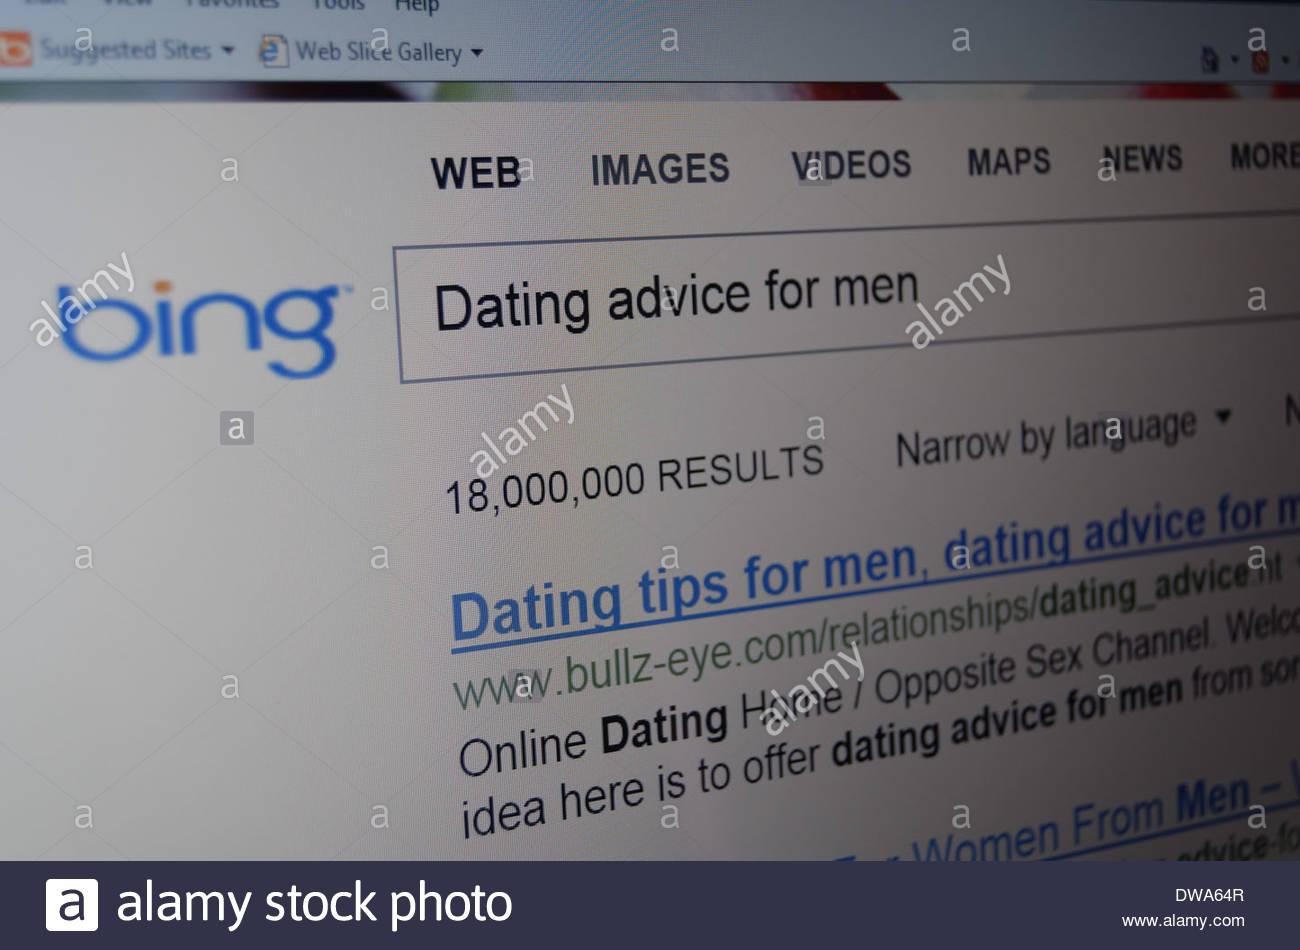 dating advice com